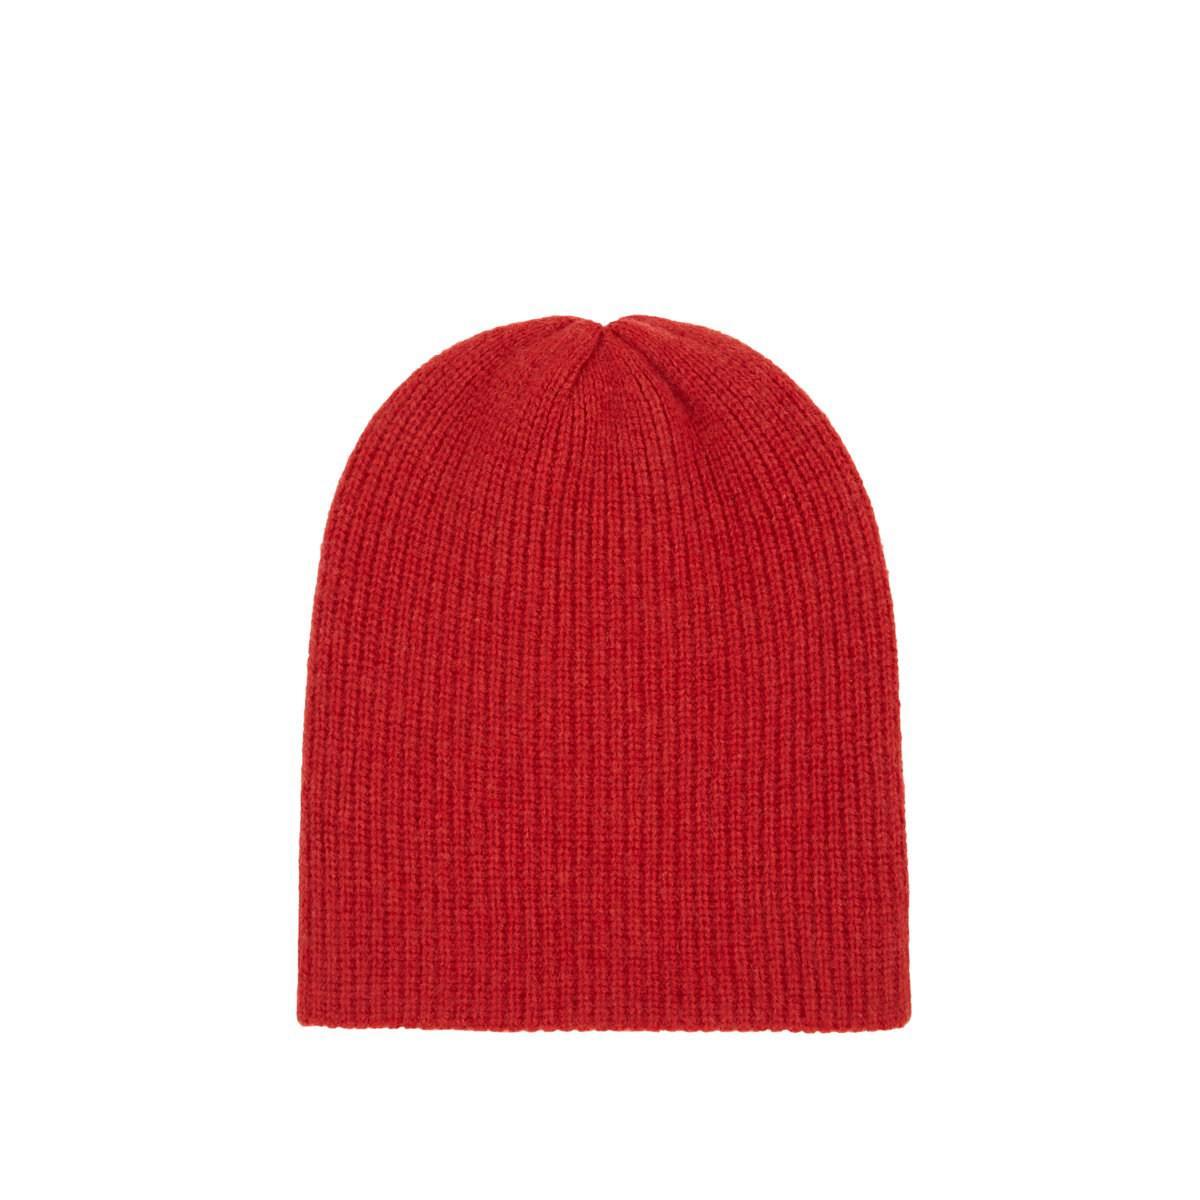 c565008691c The Elder Statesman Watchman Cashmere Cap in Red for Men - Lyst